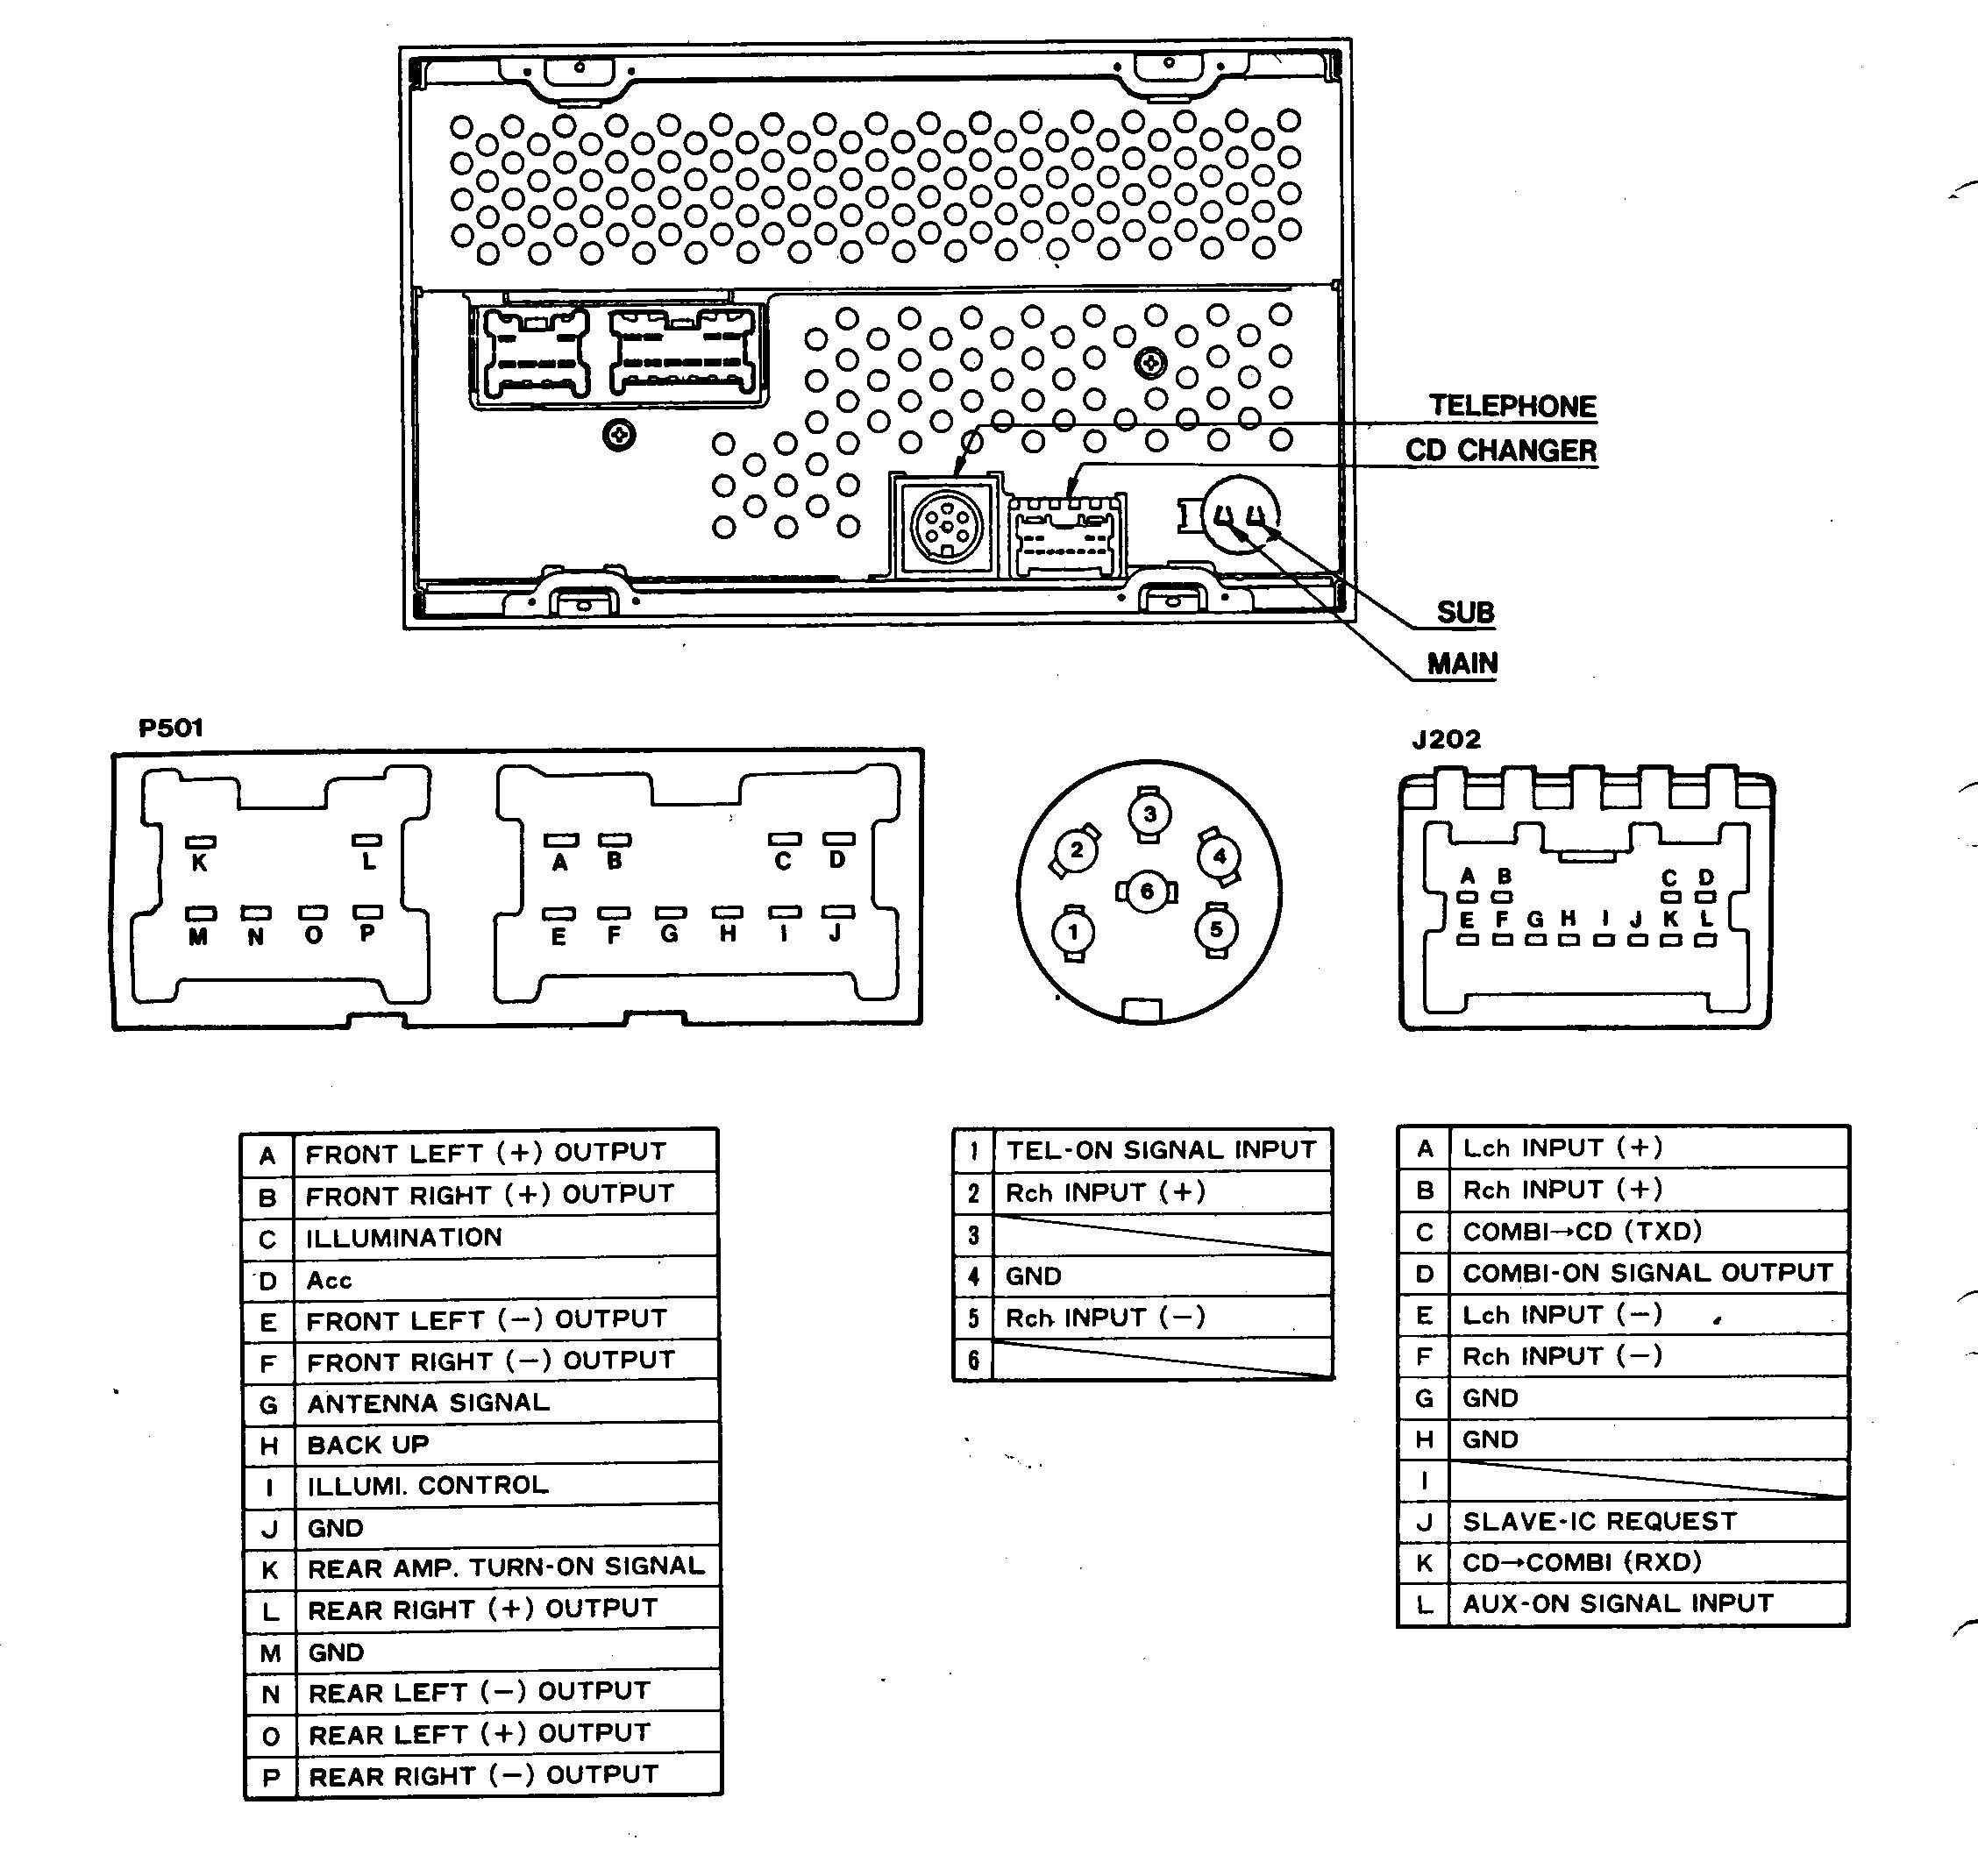 Wrg-1907] Gm Radio Wiring Schematic   2019 Ebook Library - 2011 Chevy Silverado Radio Wiring Diagram